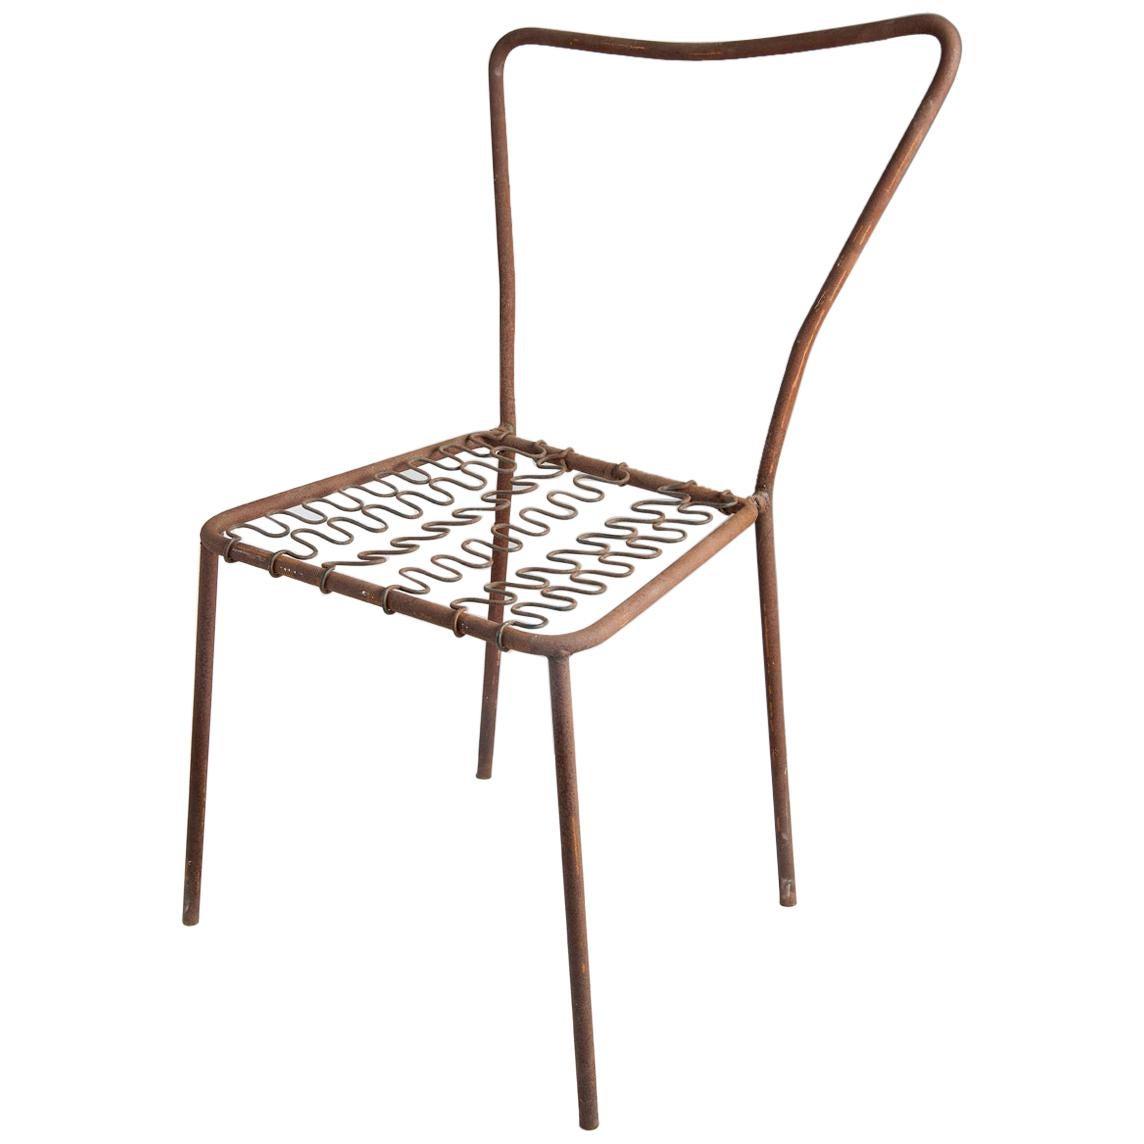 Viper Chair by Sema Topaloglu